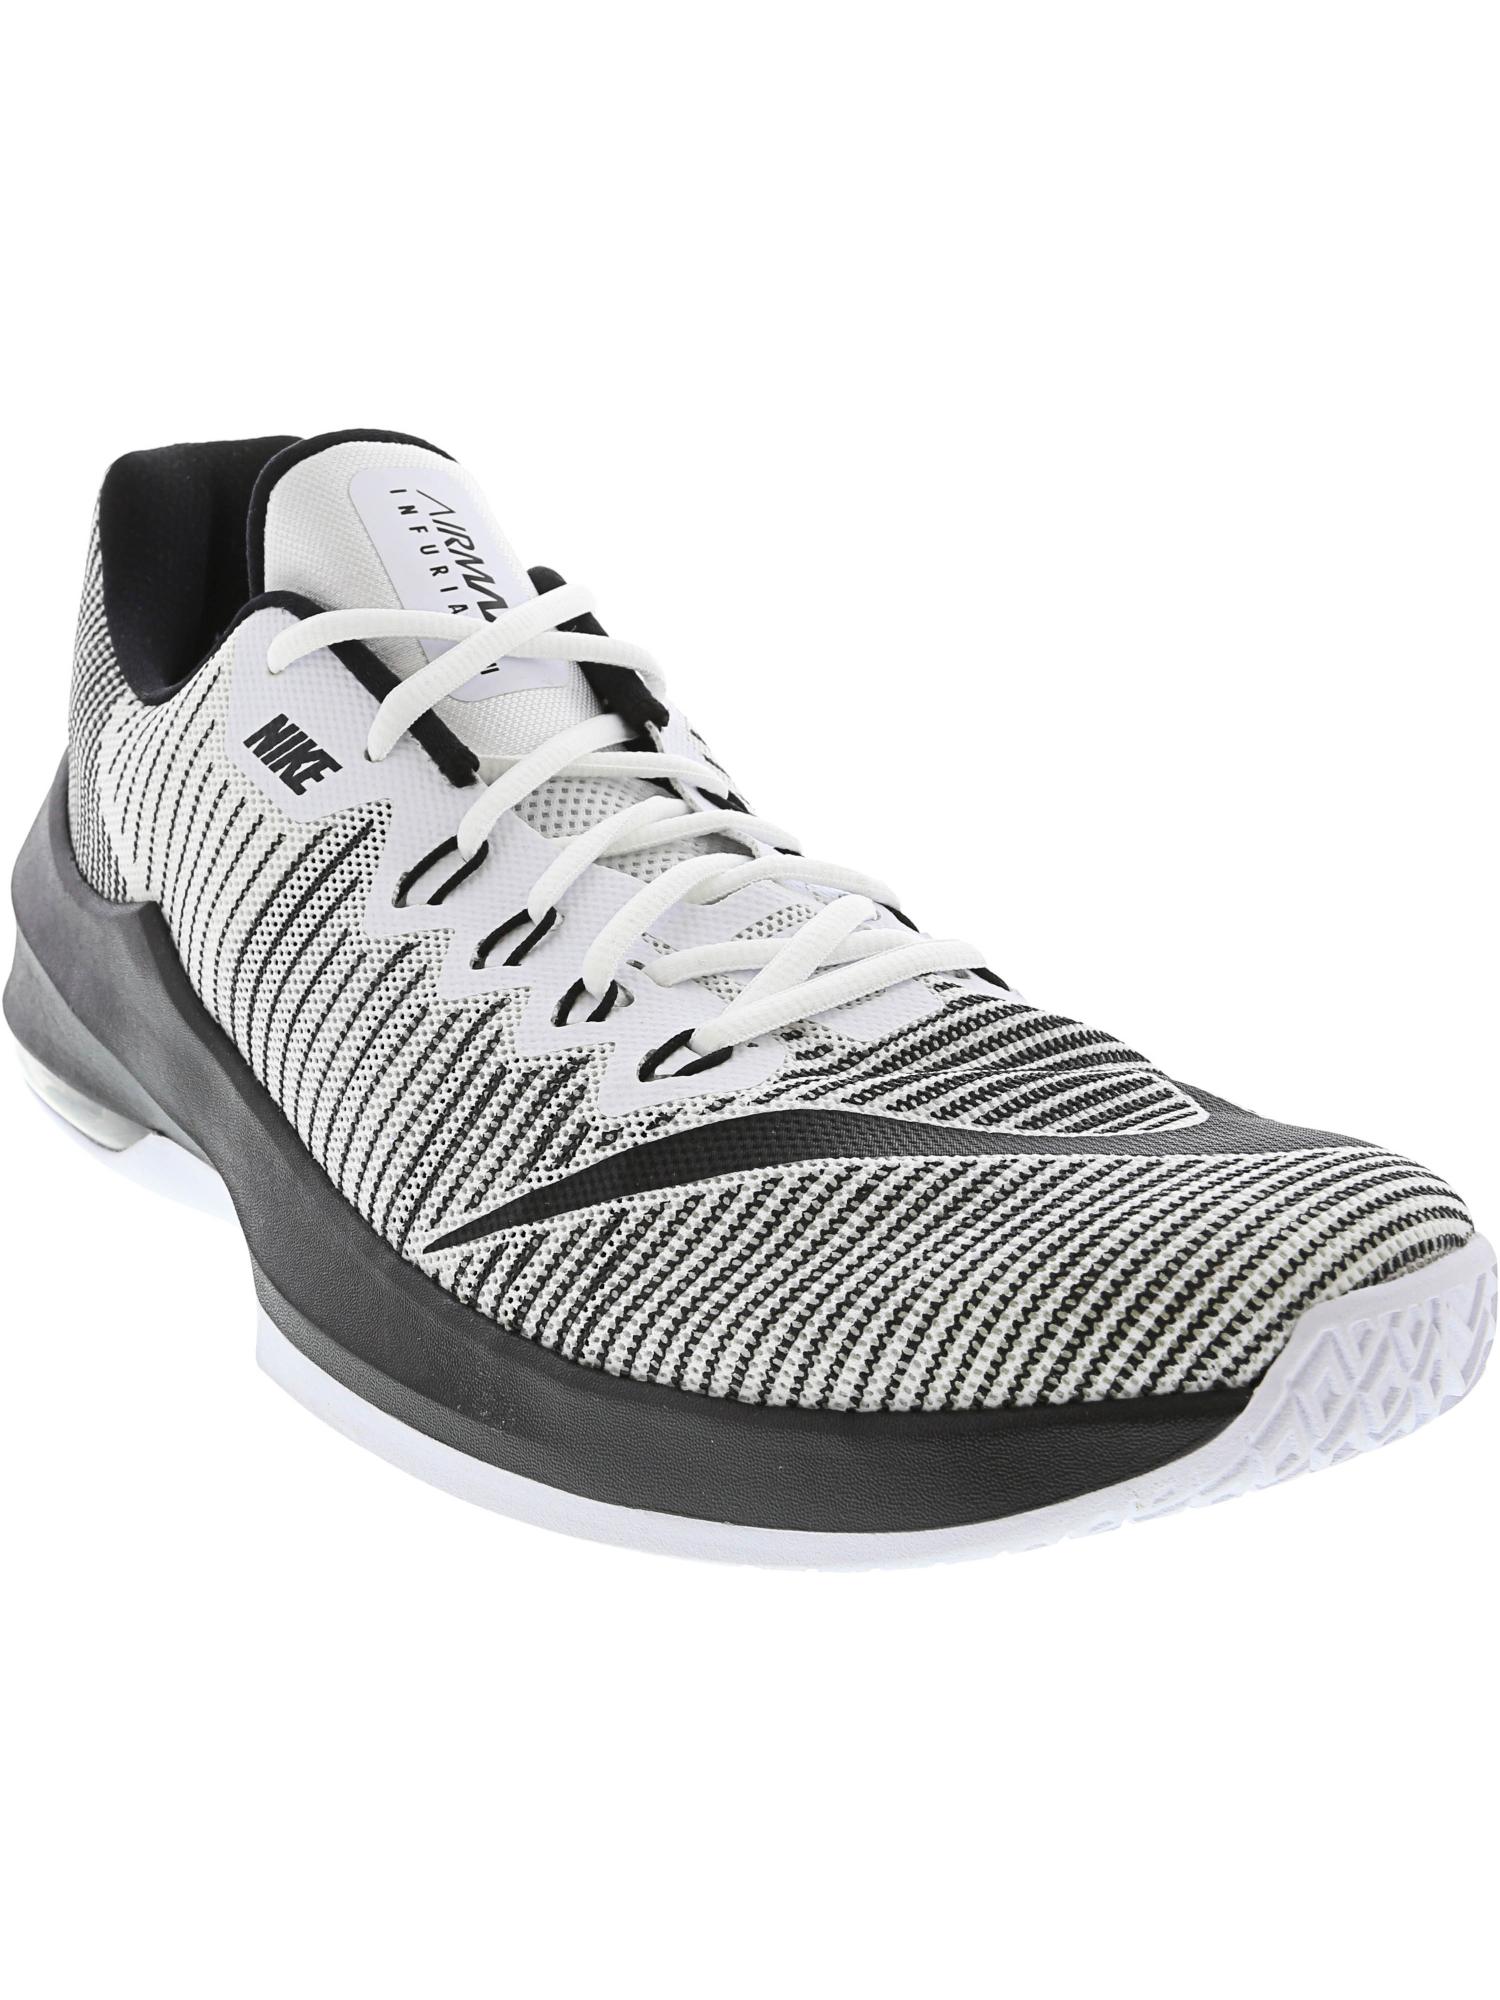 the best attitude 29b4d 606a2 Nike-Men-039-s-Air-Max-Infuriate-2-